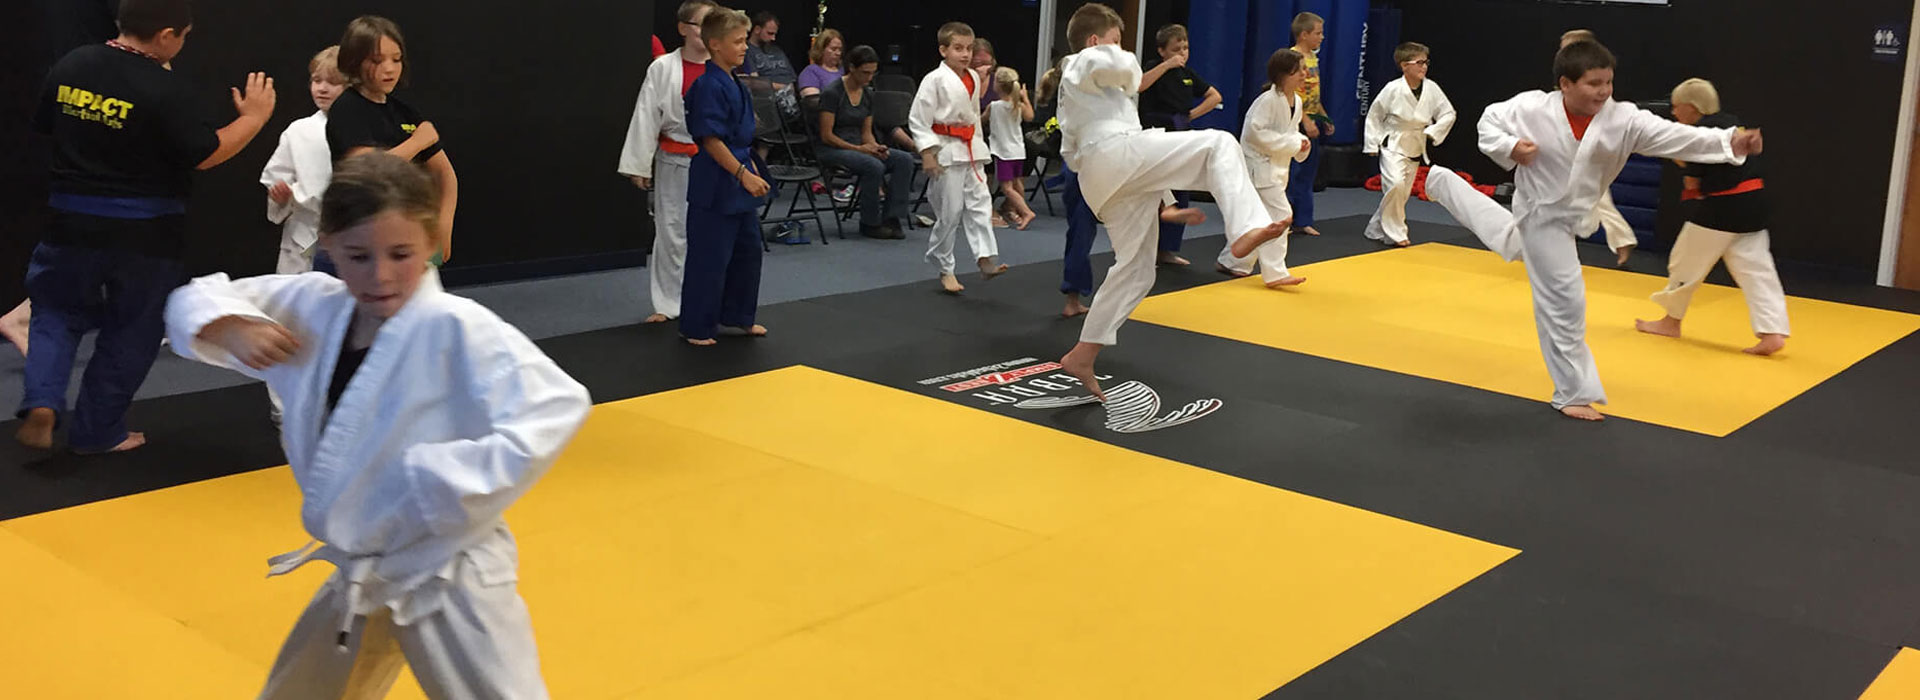 Little Dragons Program at Impact Martial Arts in Oshkosh, WI